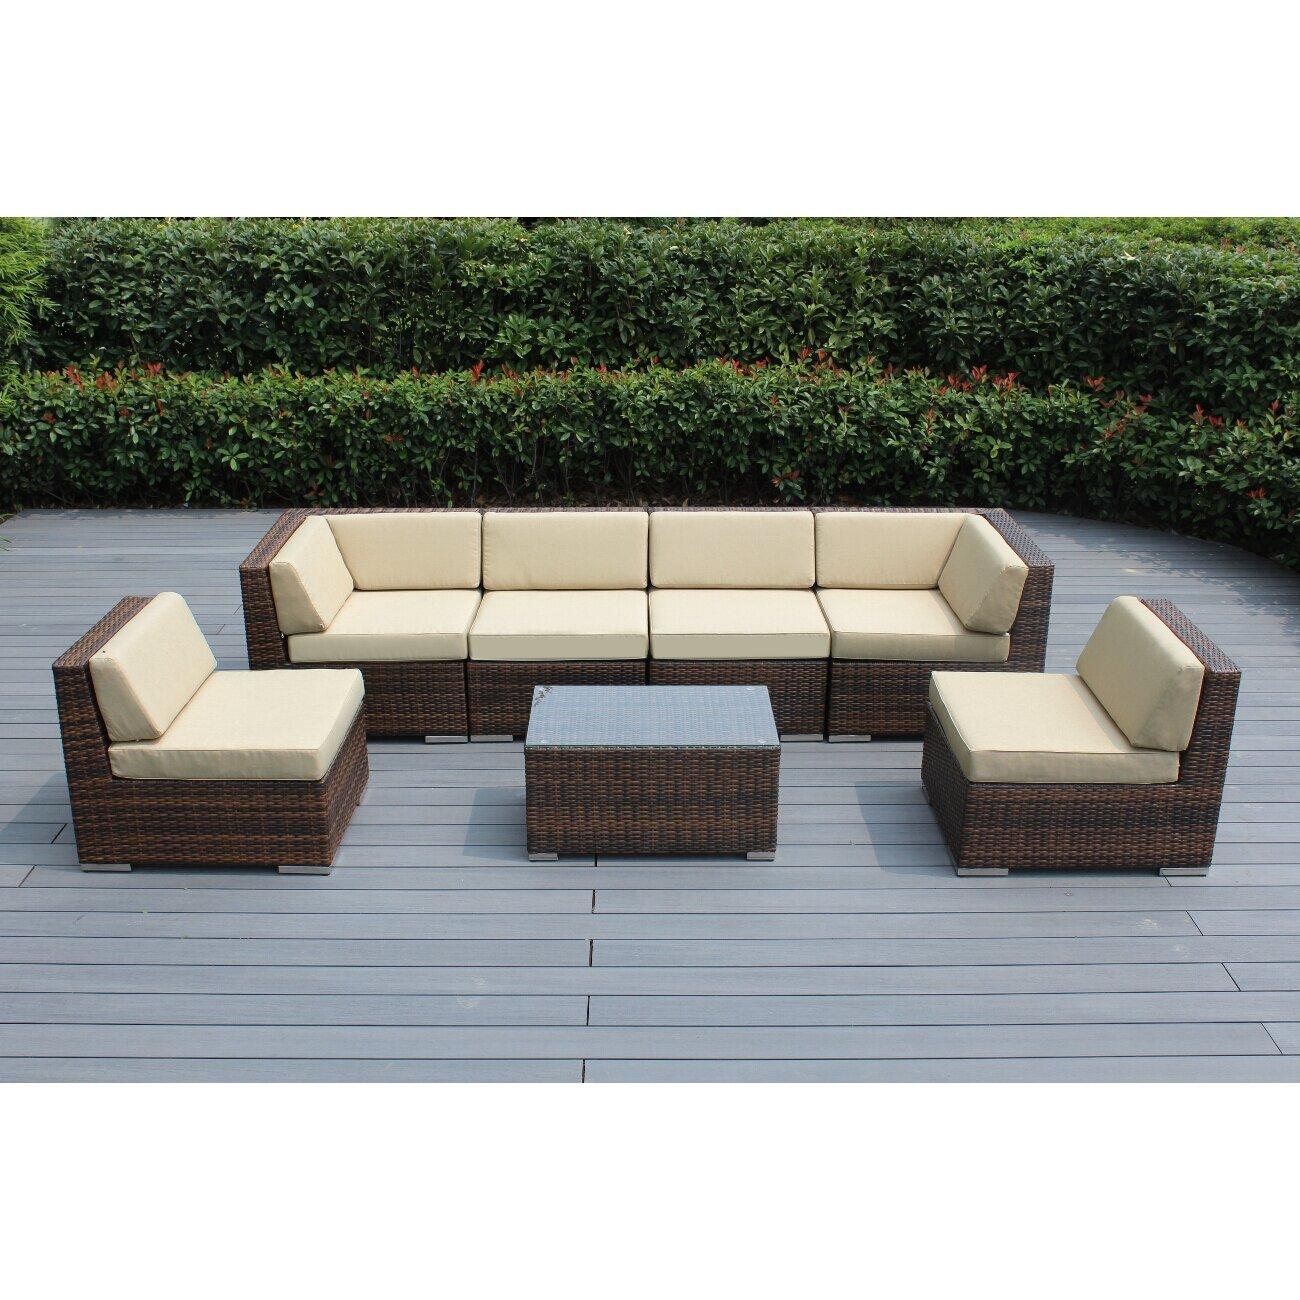 Inspirational Ohana Outdoor Furniture Reviews